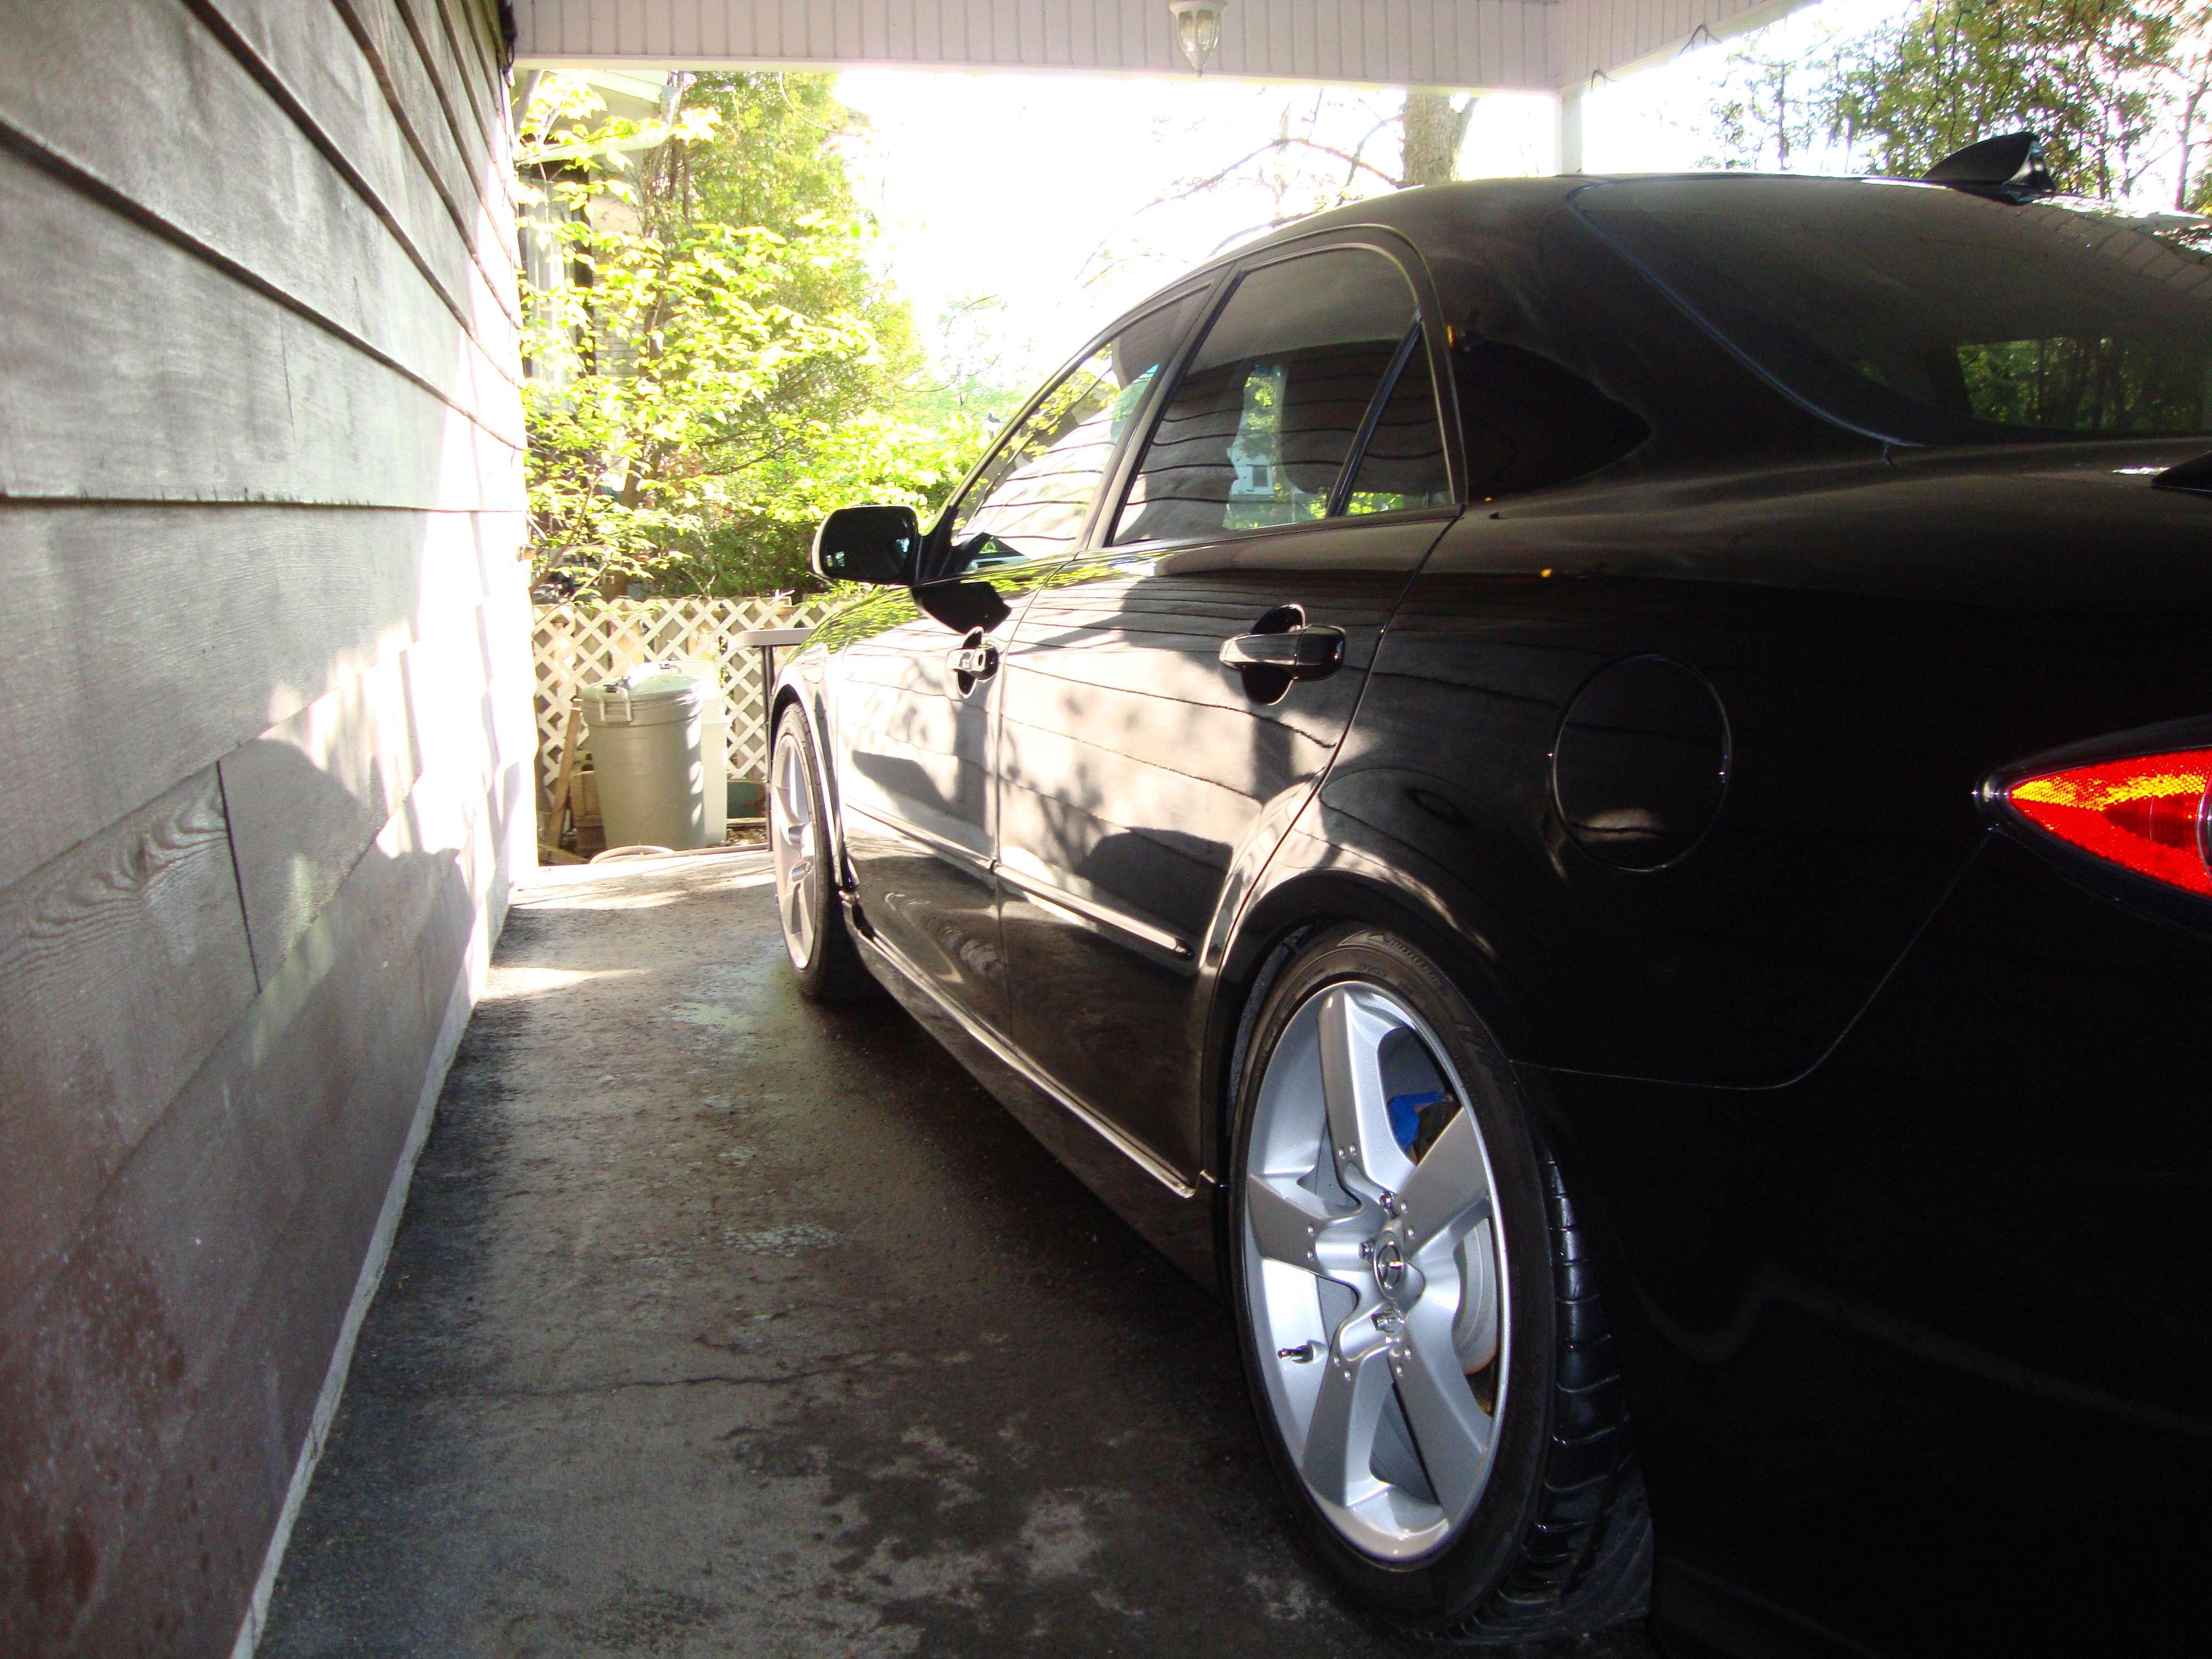 Major Oxyded Black Mazda 6 Showroom Perfection